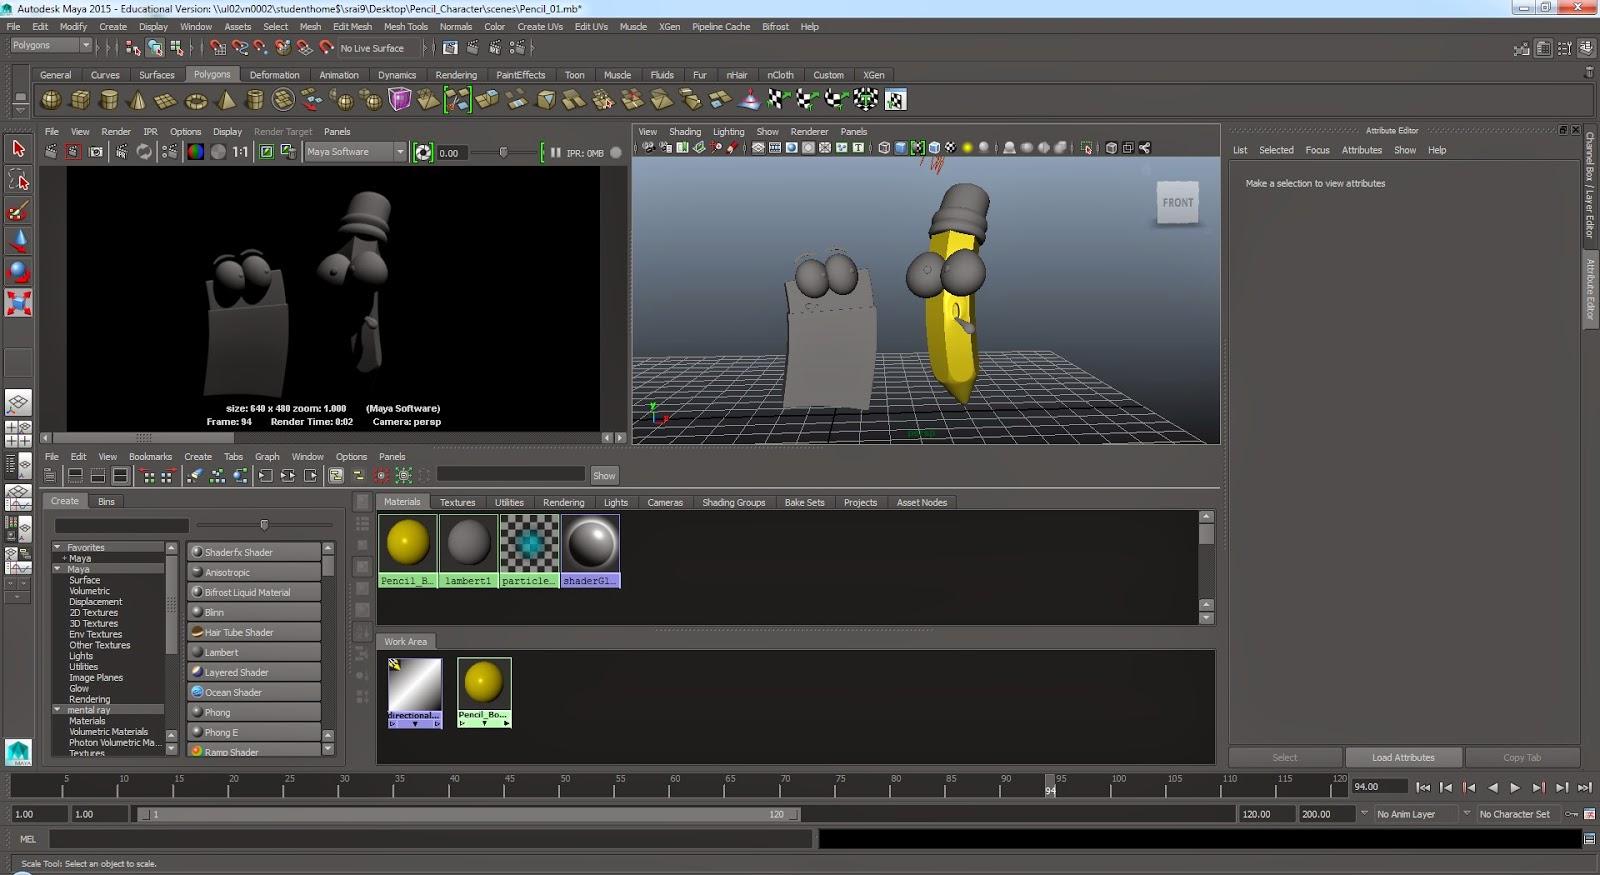 SACHIN RAI - COMPUTER ANIMATION ARTS UCA ROCHESTER: Maya